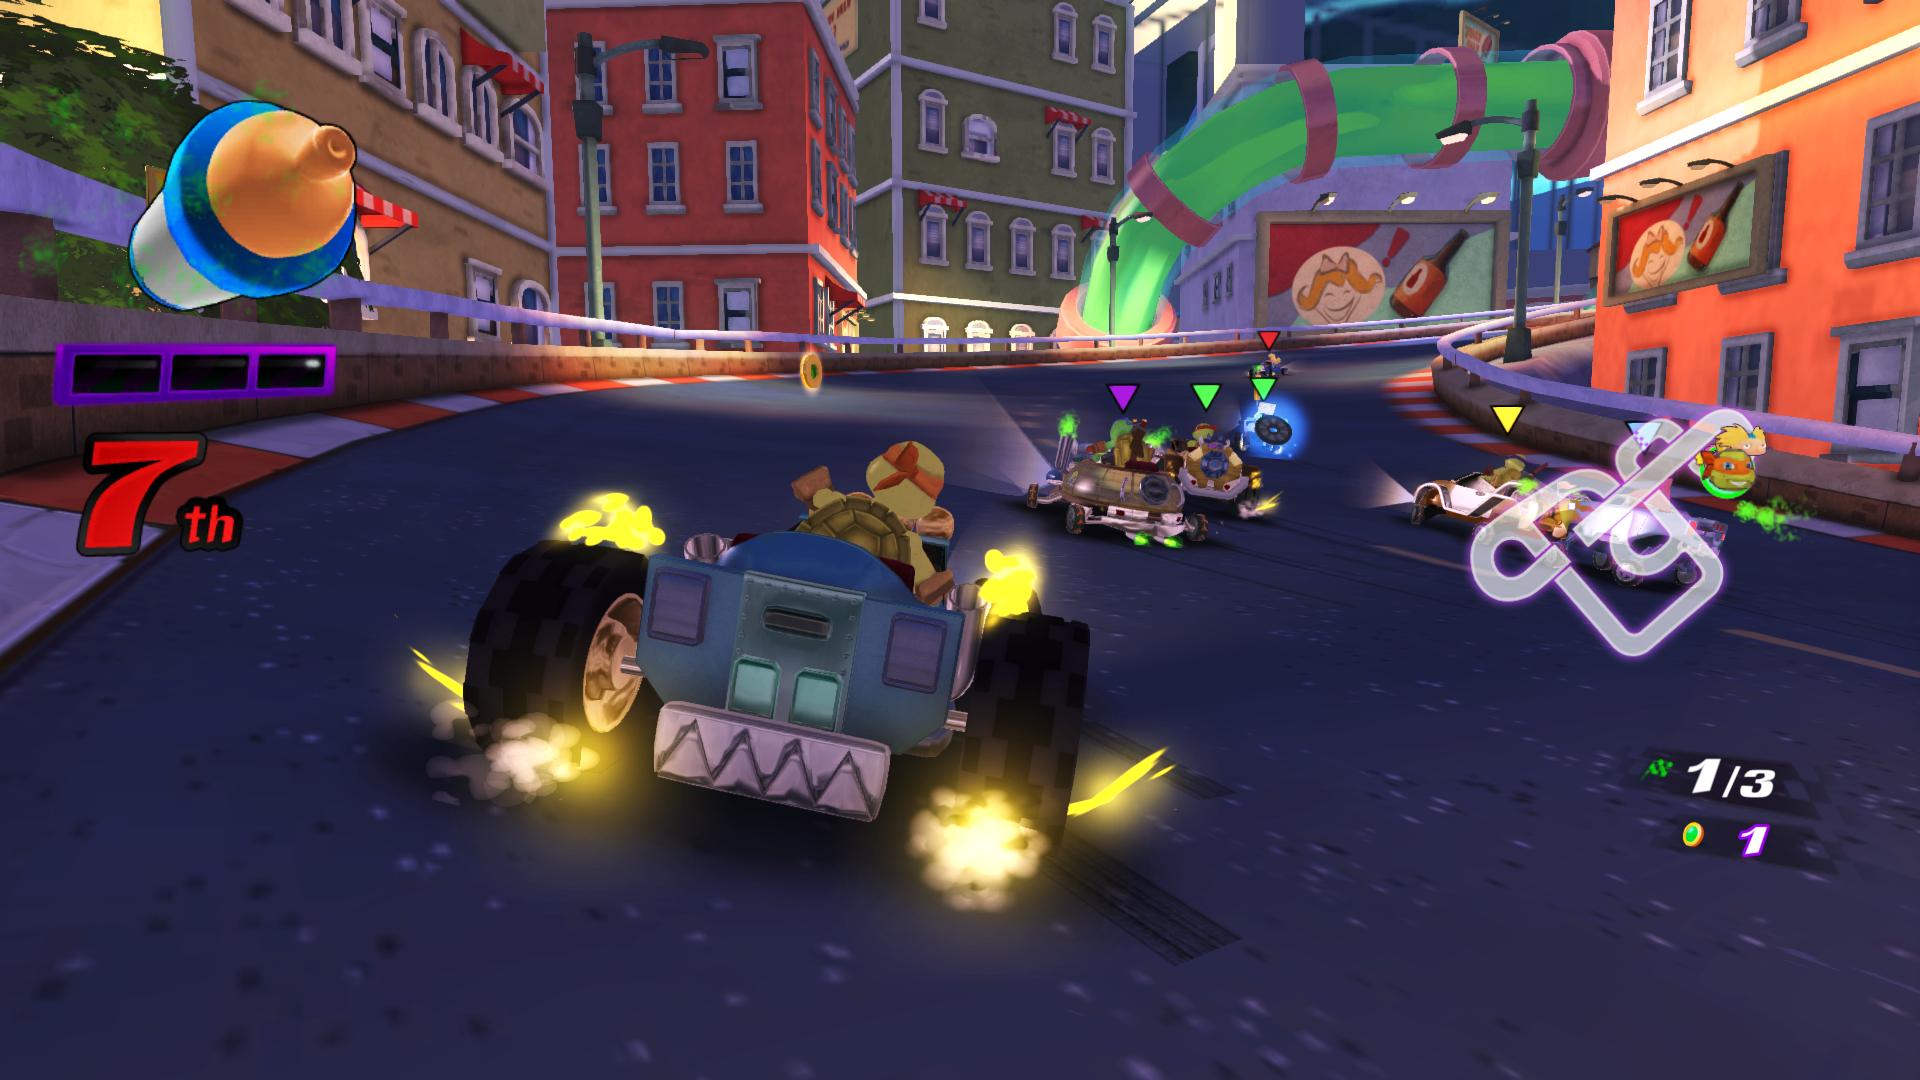 Nickelodeon Kart Racers Reunites Classic Cartoons On Consoles This